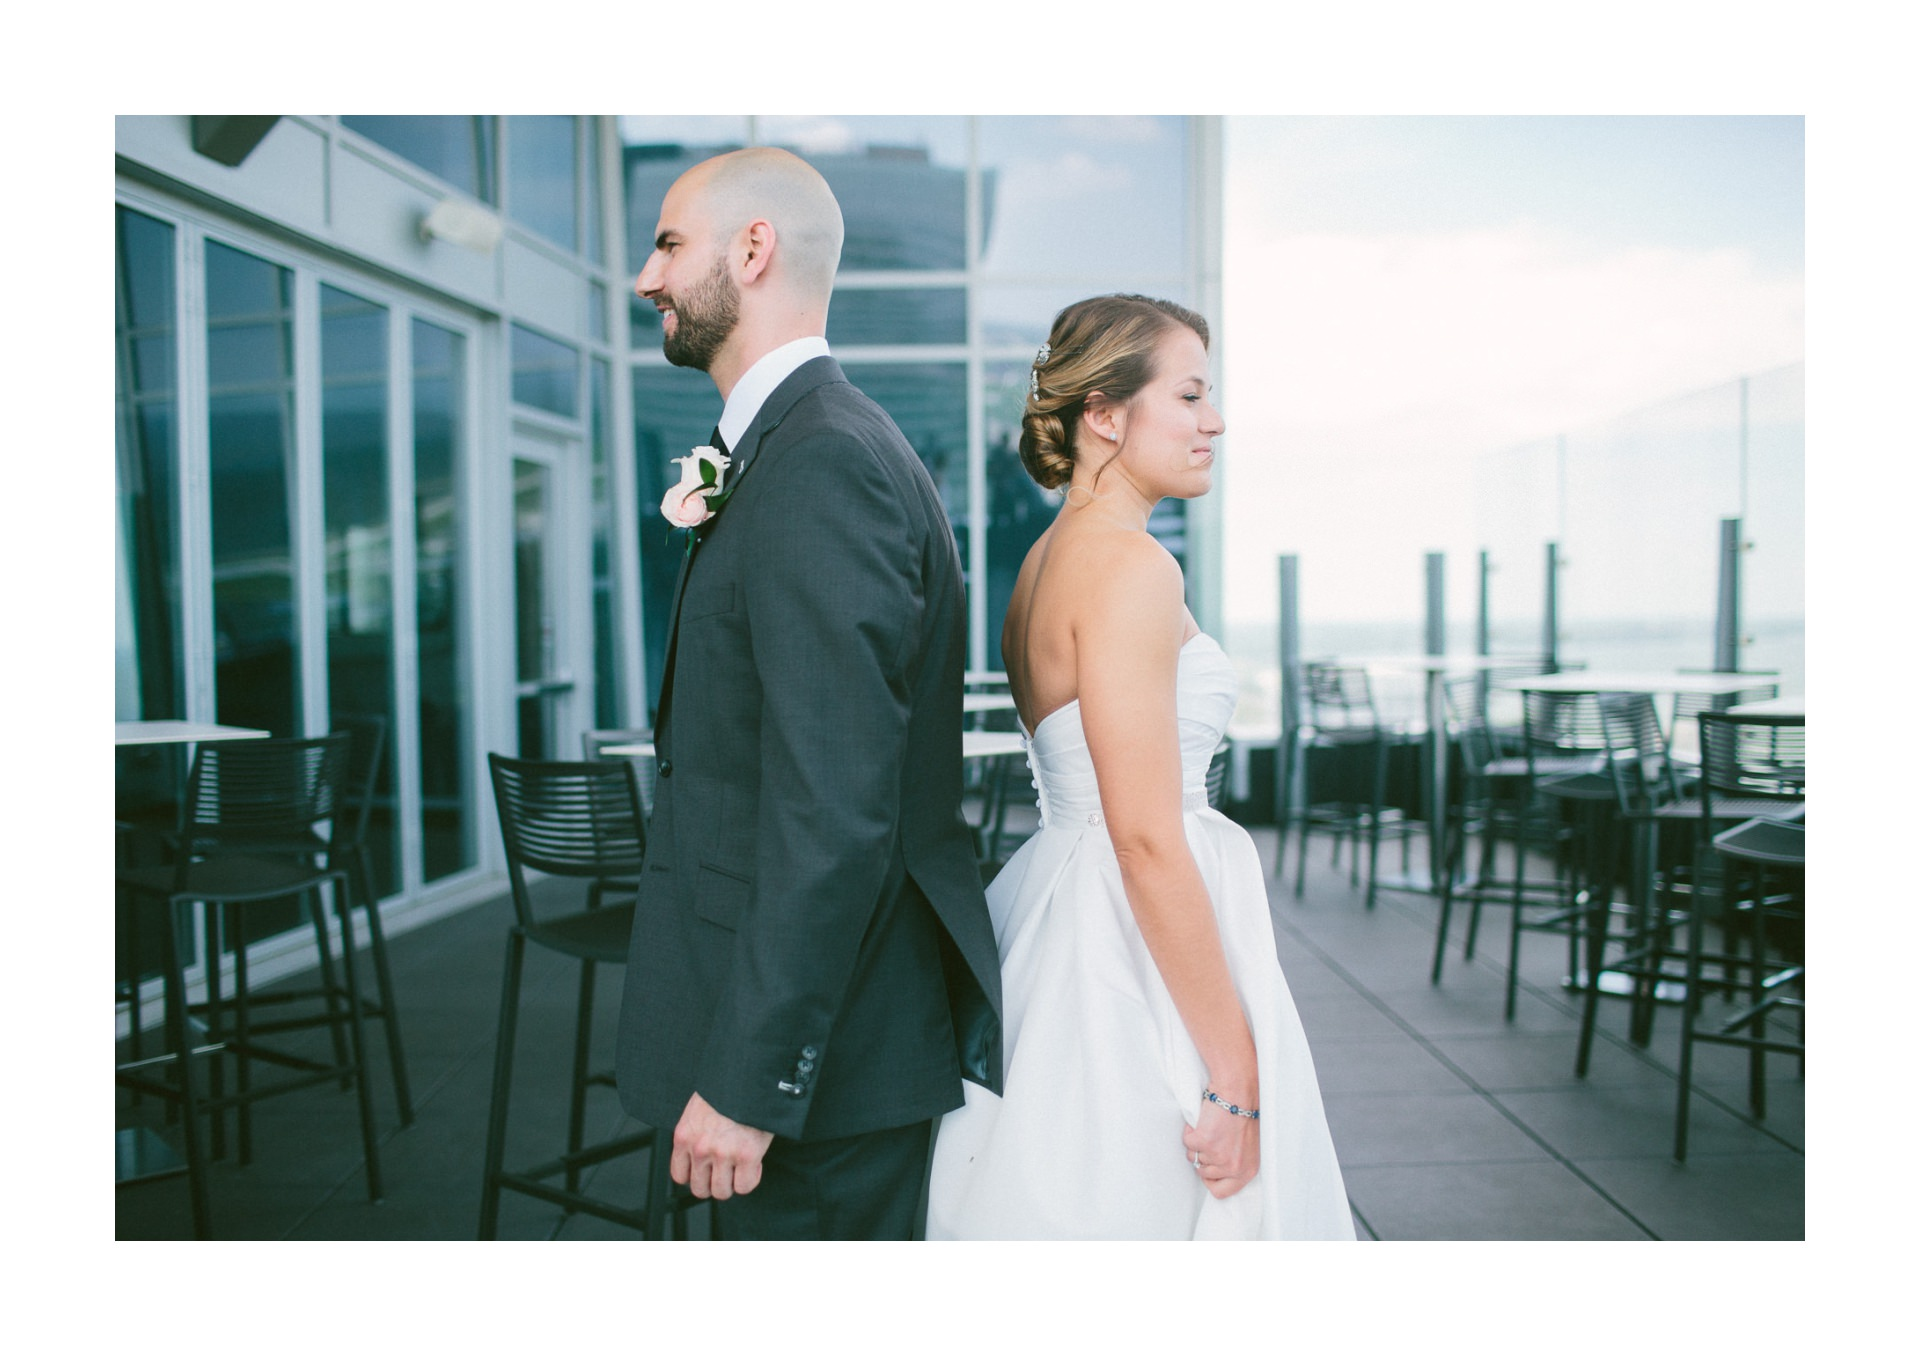 Dowtown Hilton Cleveland Wedding Photographer 1 25.jpg